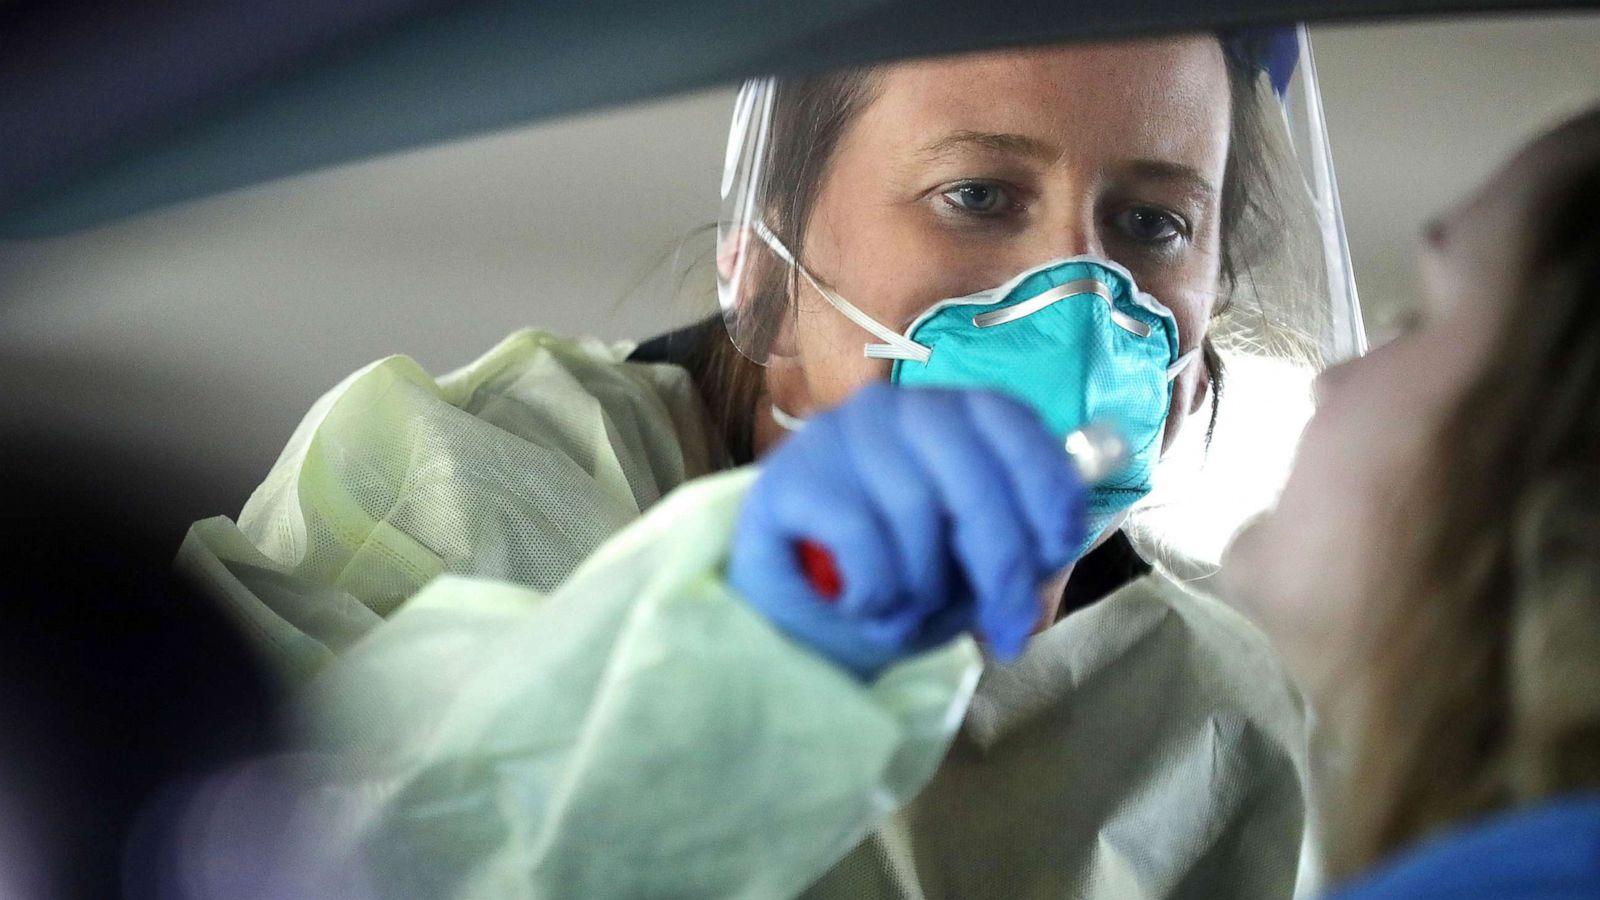 1st Responders Brace For Coronavirus Spread Amid Equipment